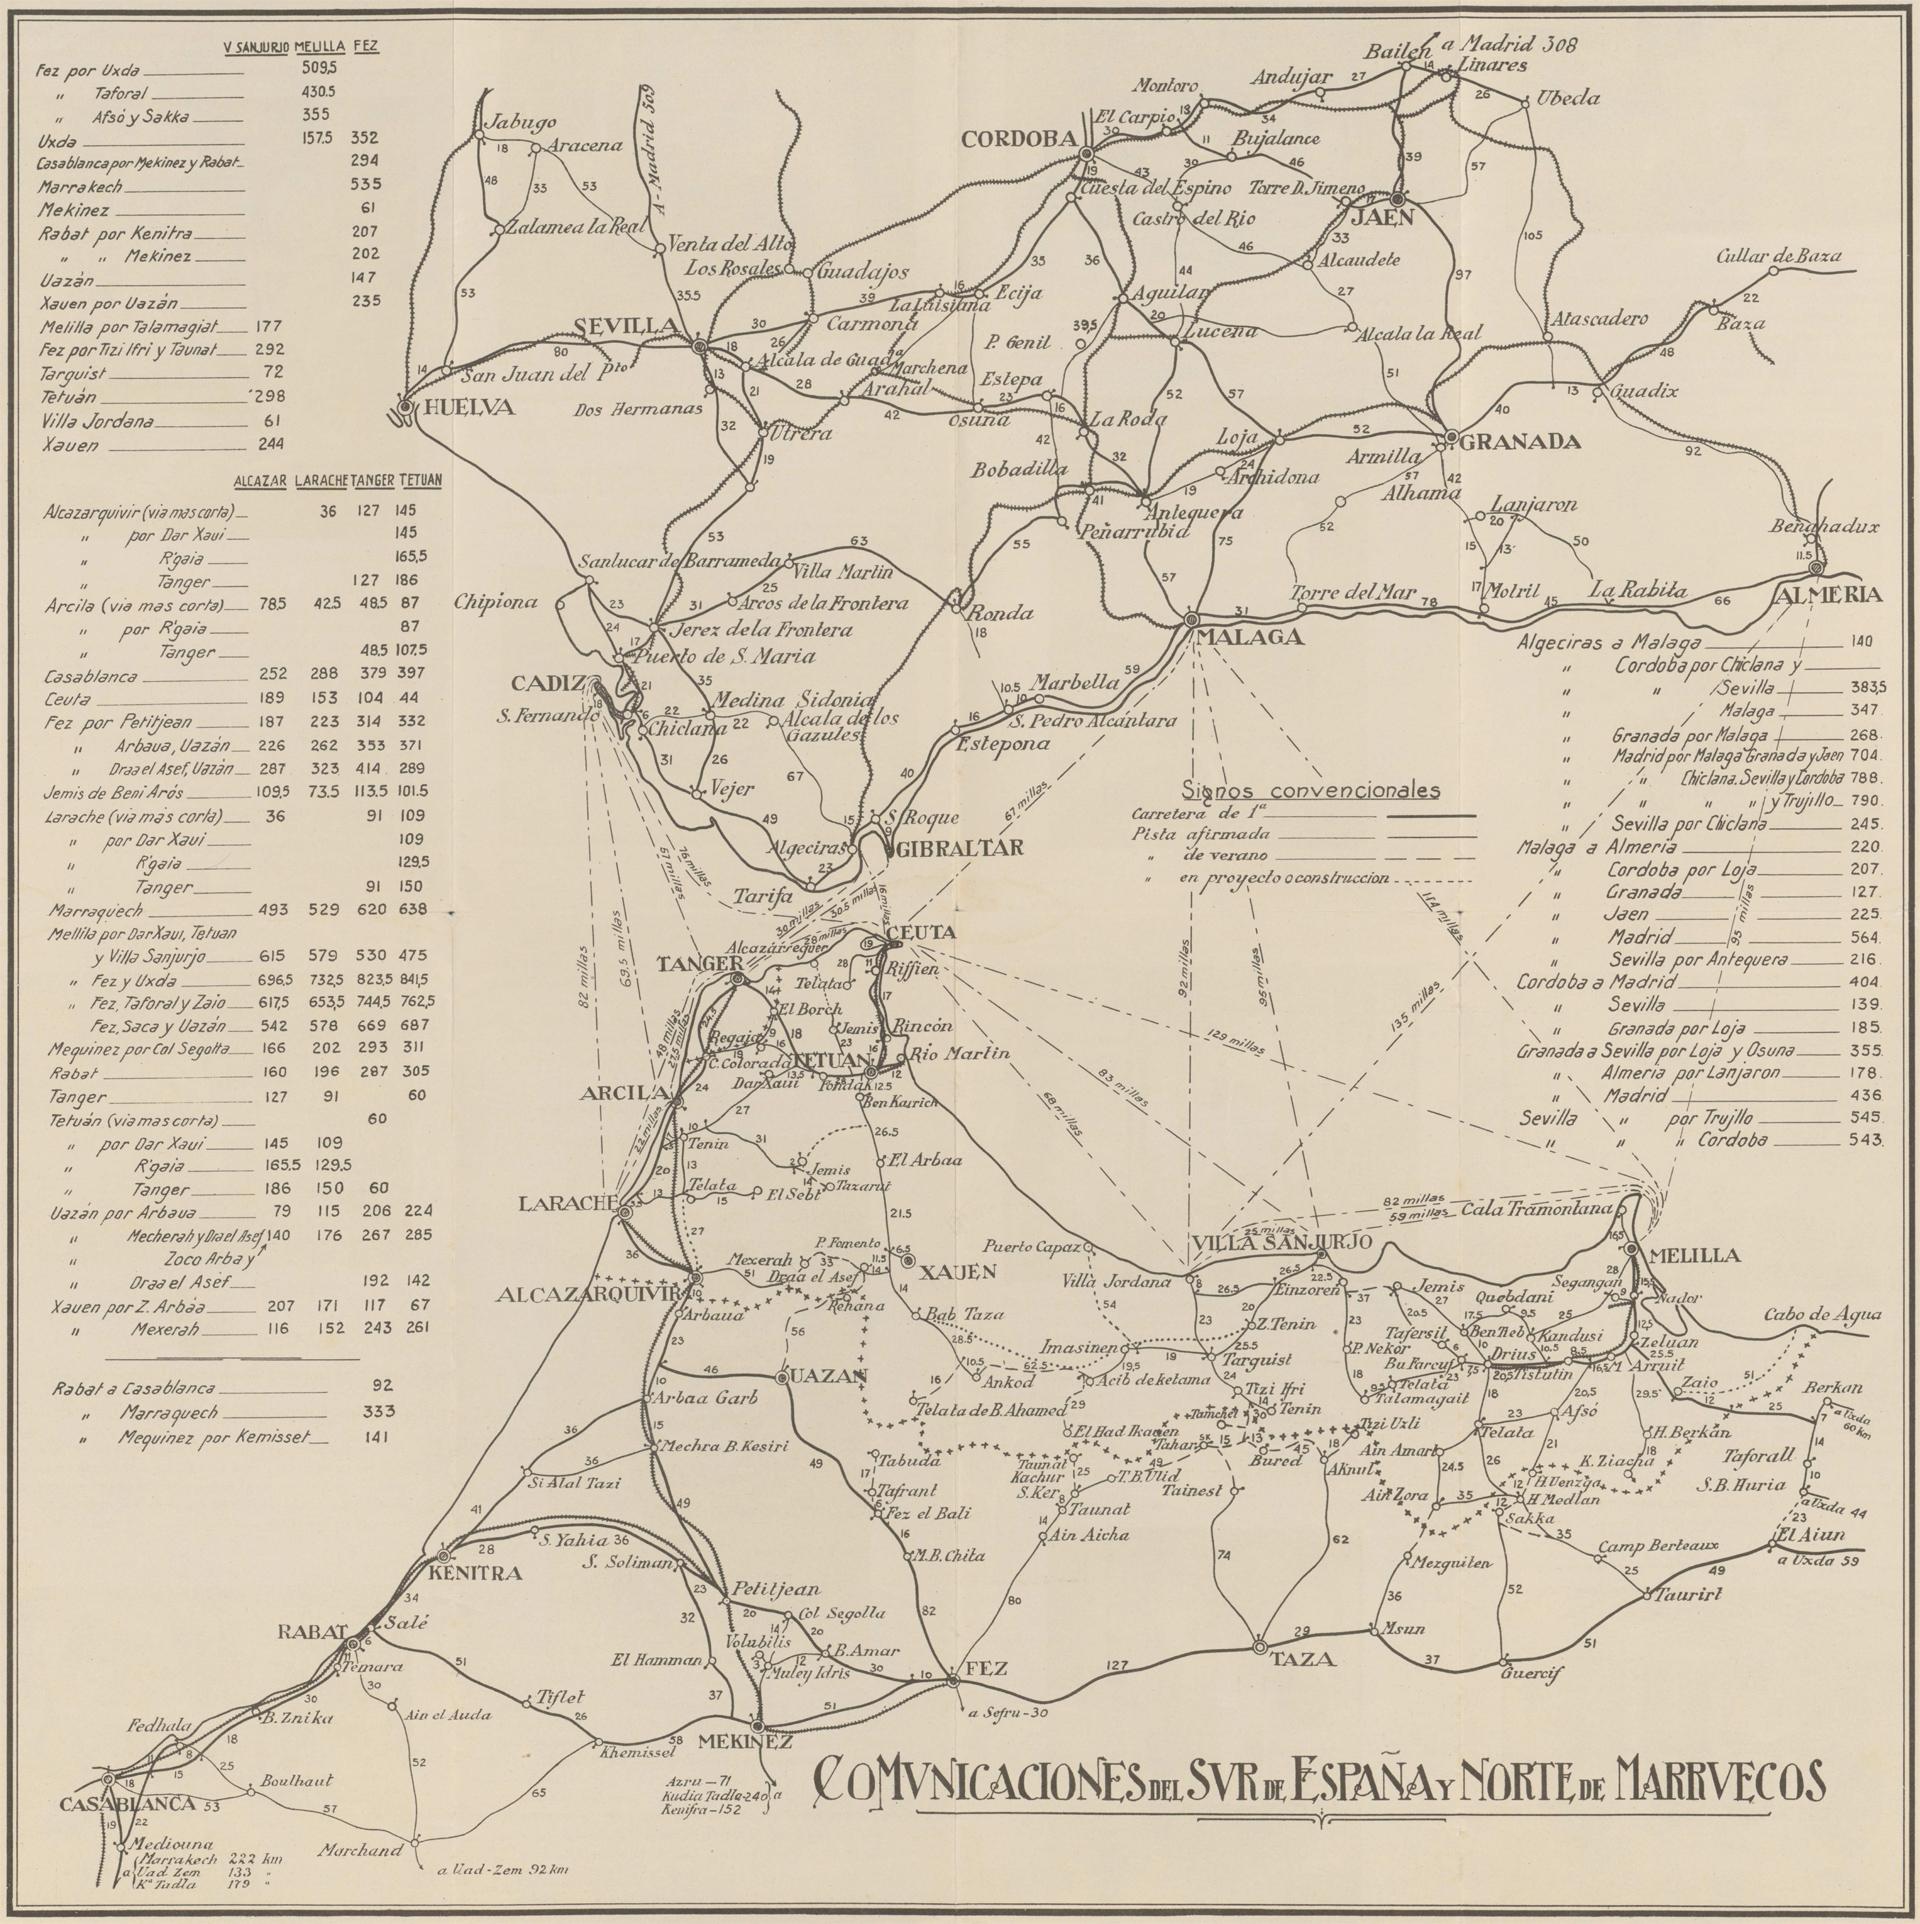 Mapa de ejemplo 2